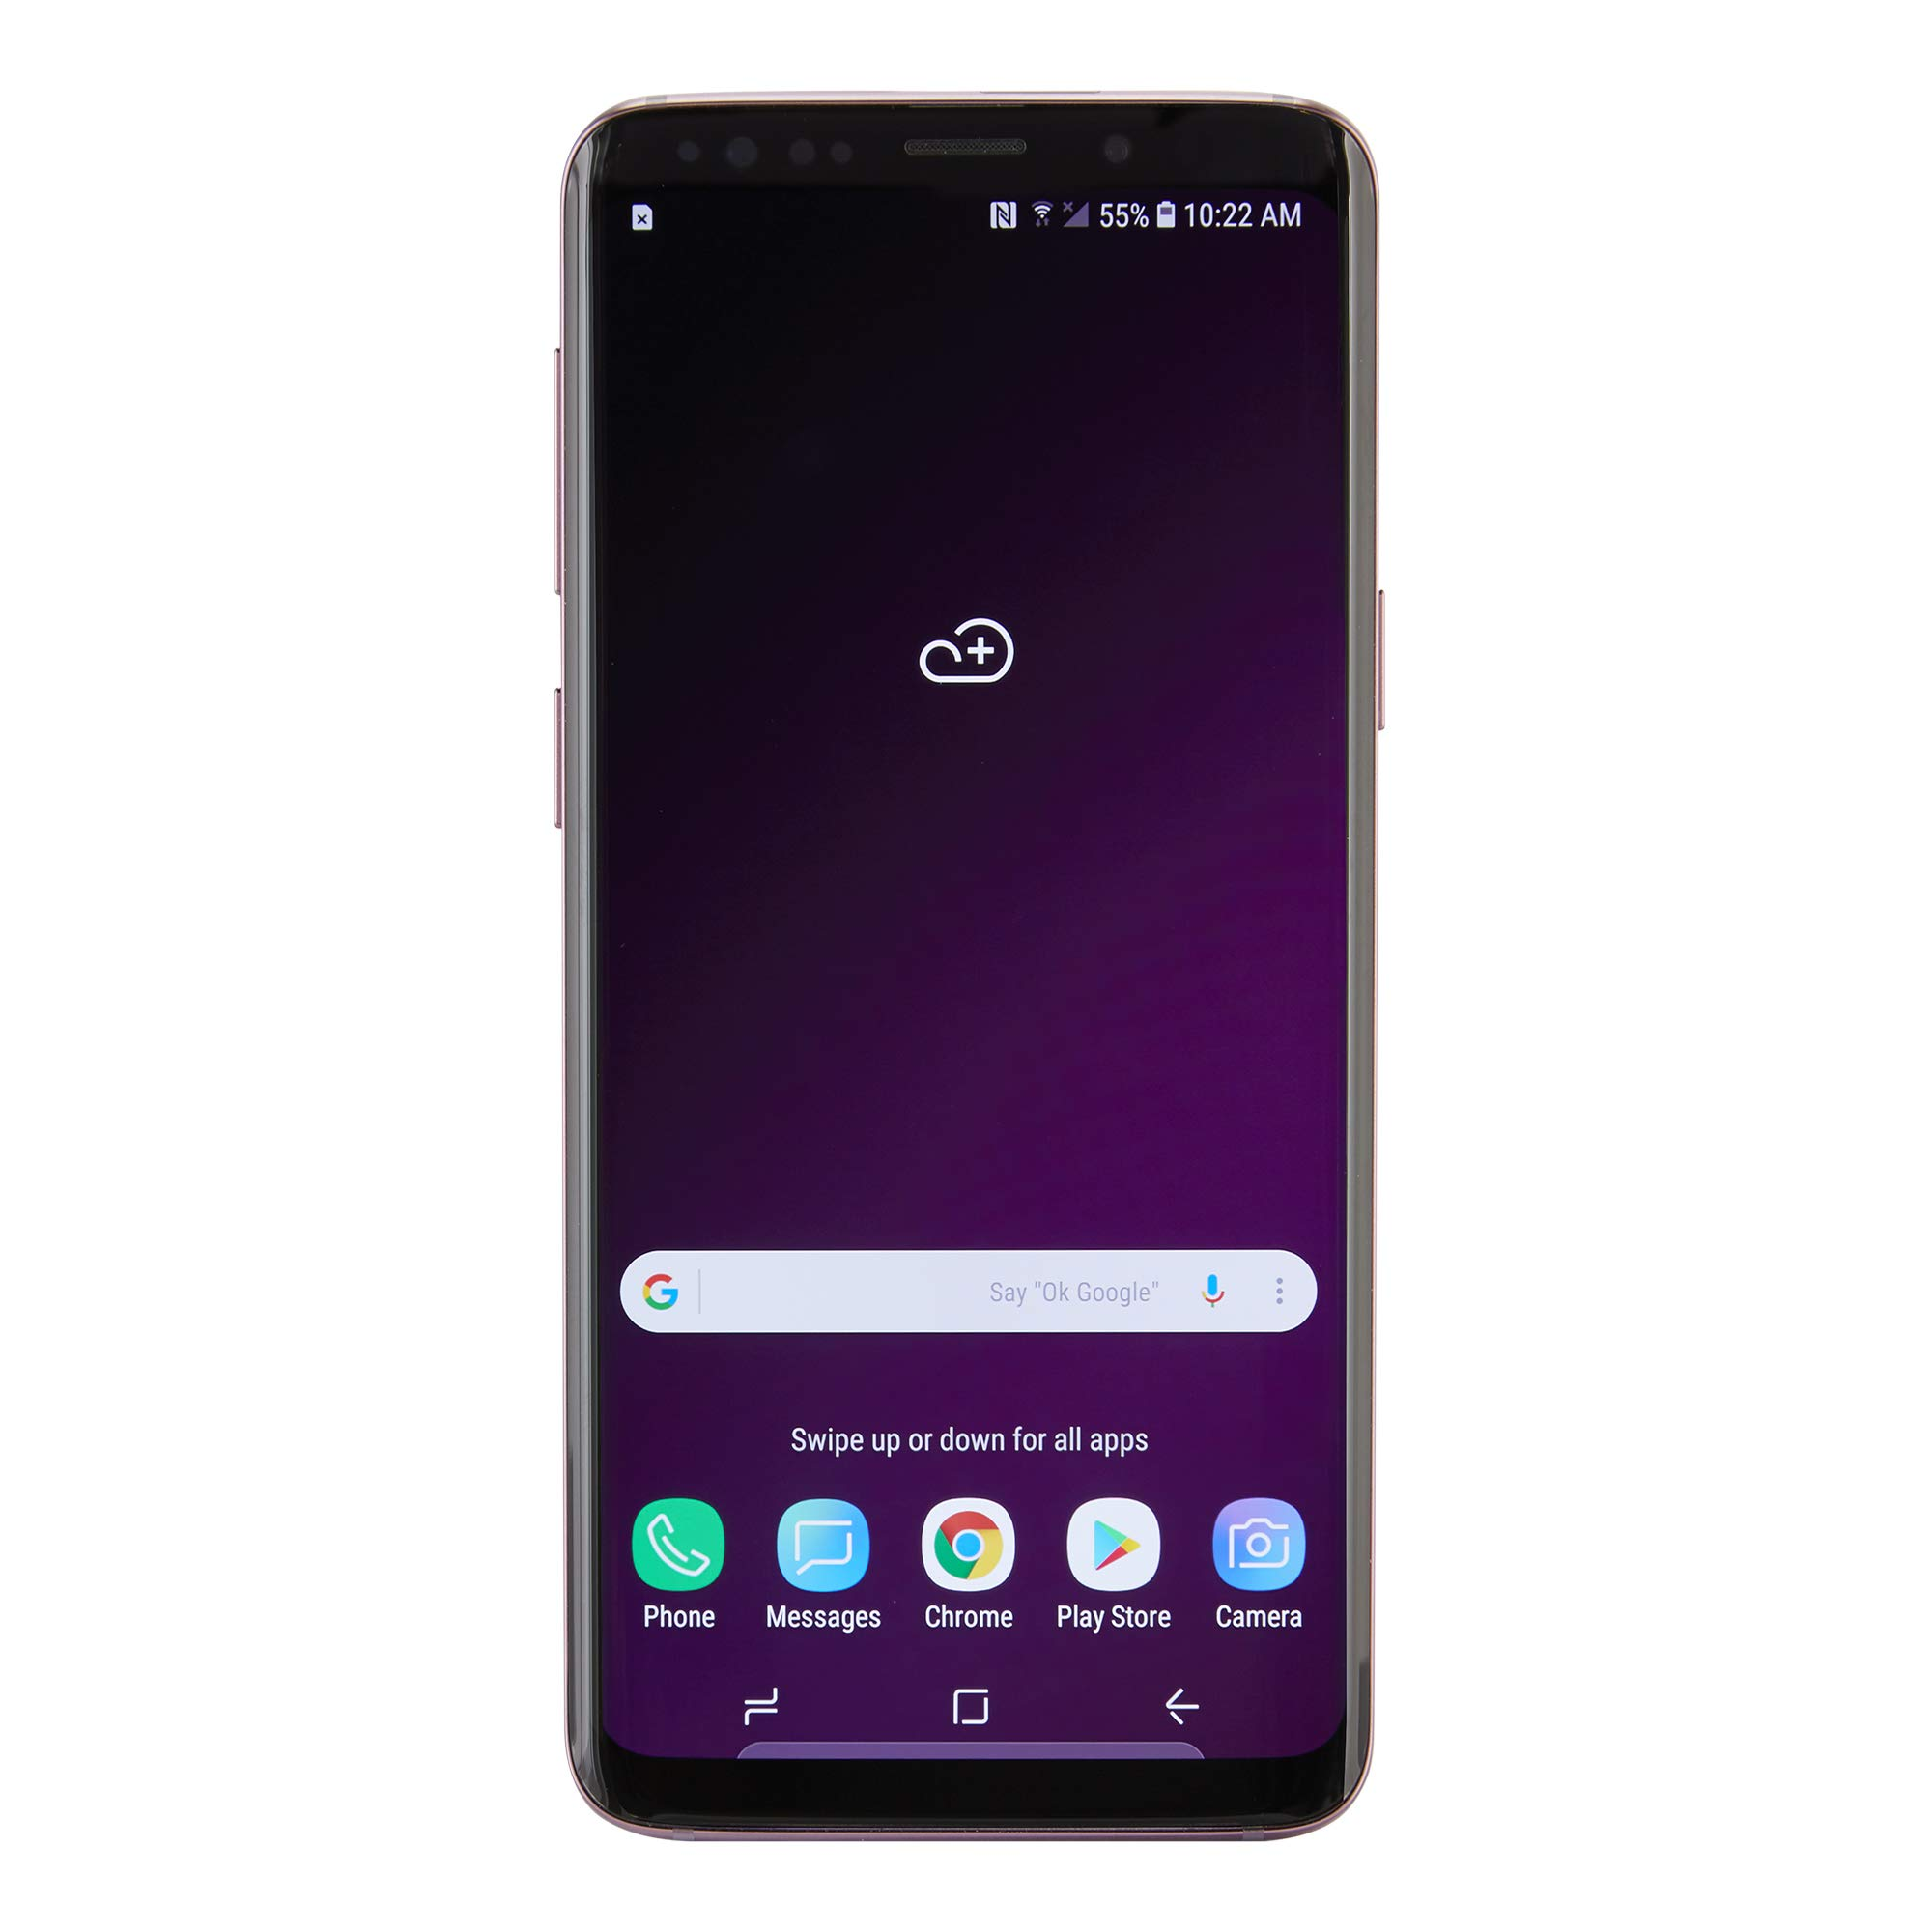 Samsung Galaxy S9, 64GB, Lilac Purple - For Verizon (Renewed)